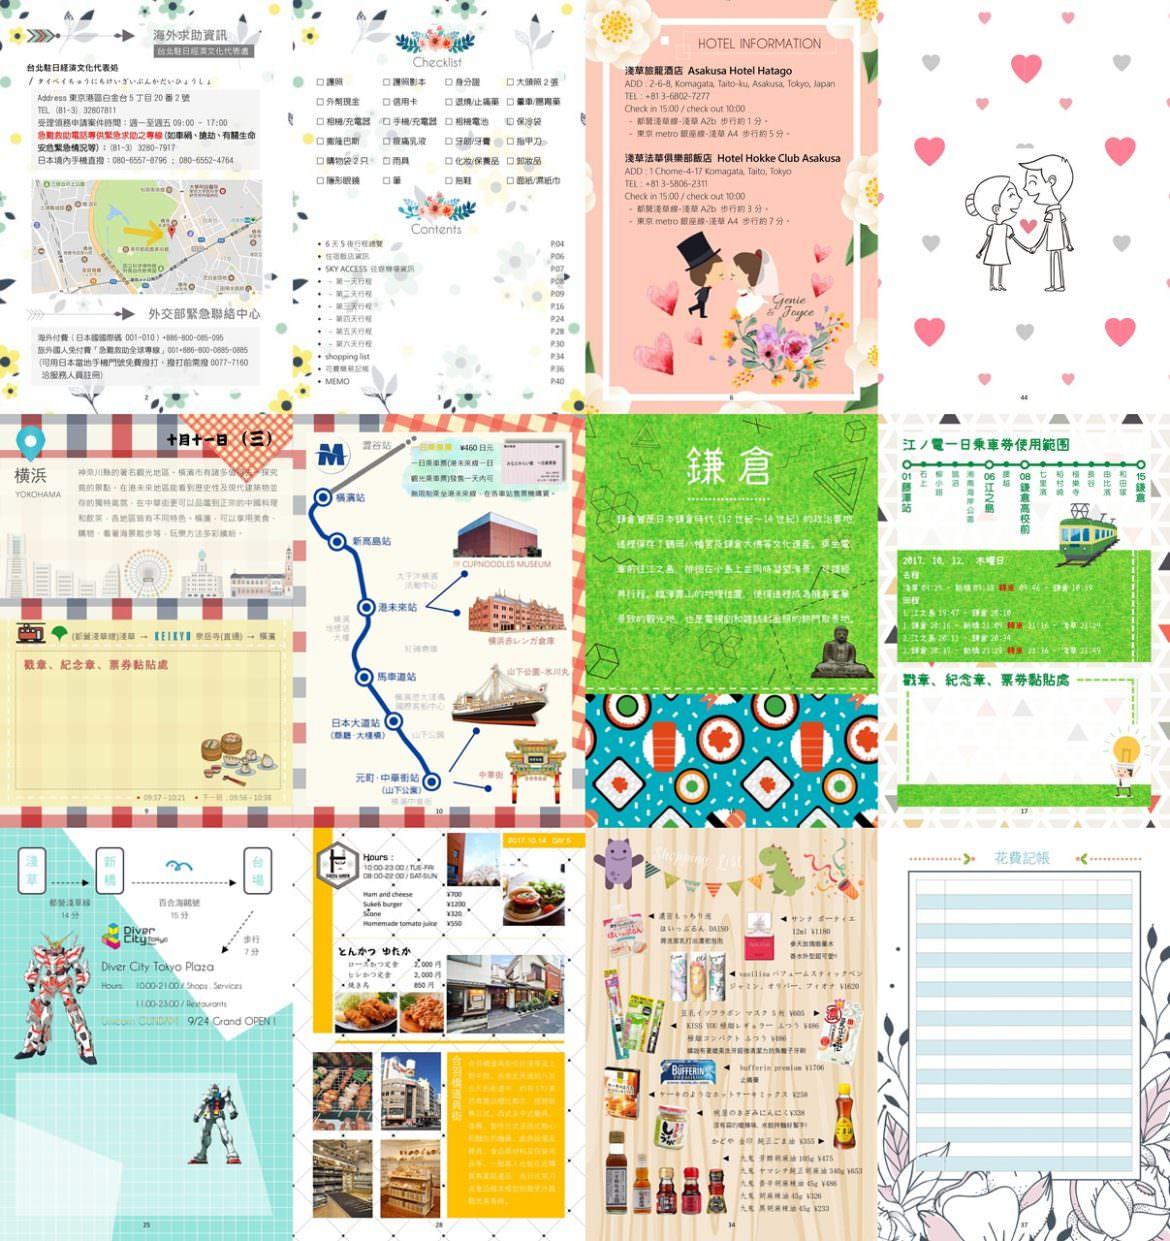 DIY自製旅遊書手冊.用word製作可愛的自製旅行書分享!